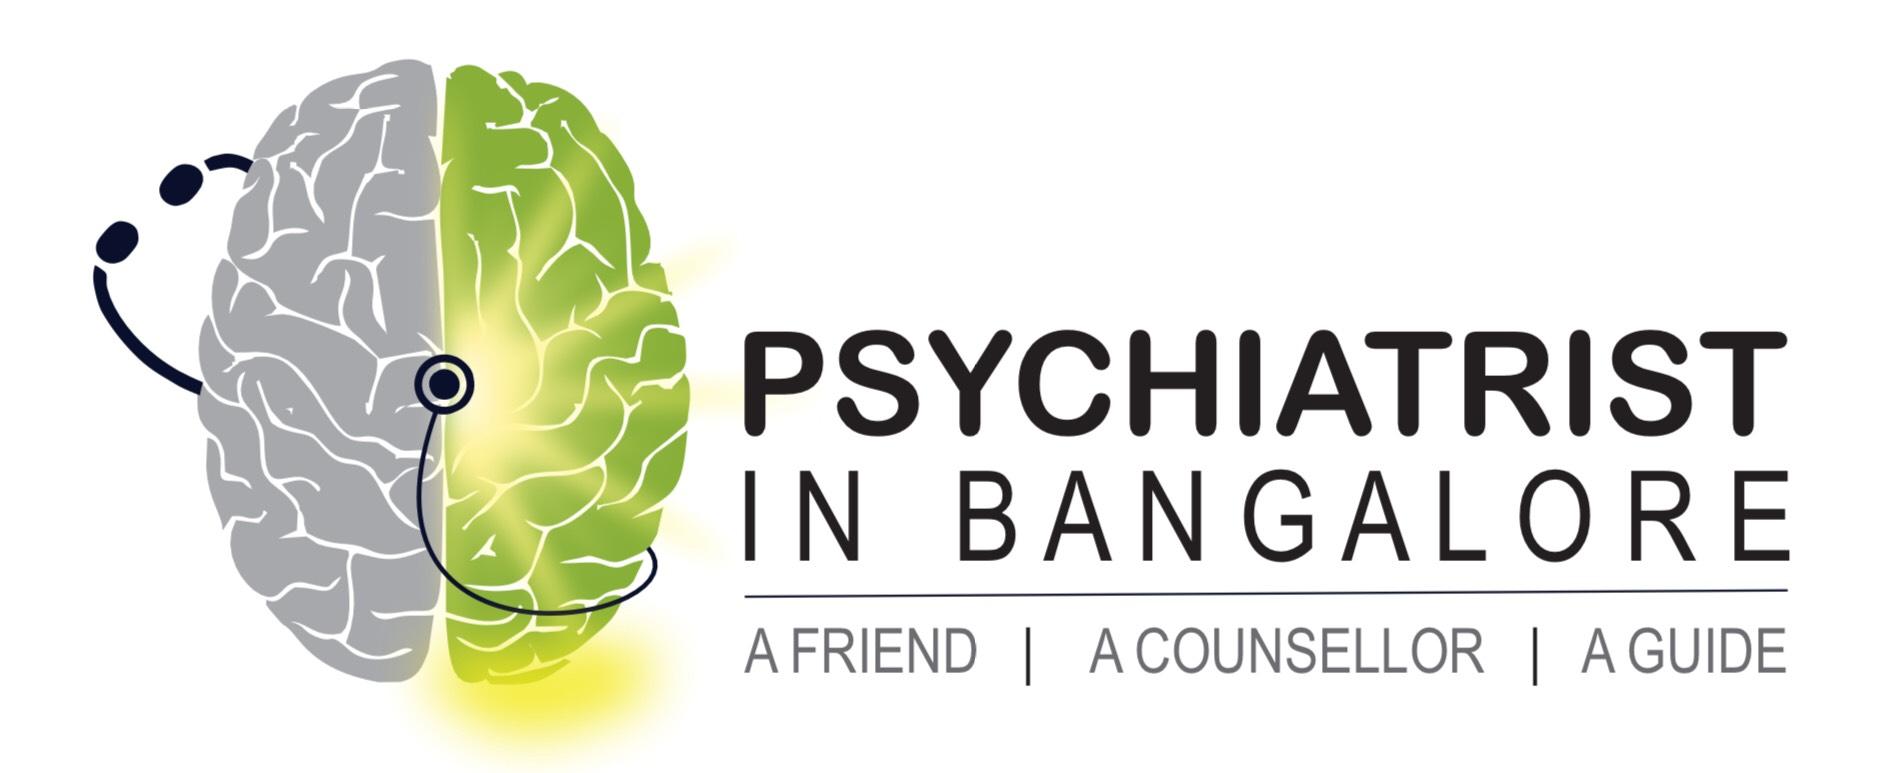 Psychiatrist In Bangalore:Online